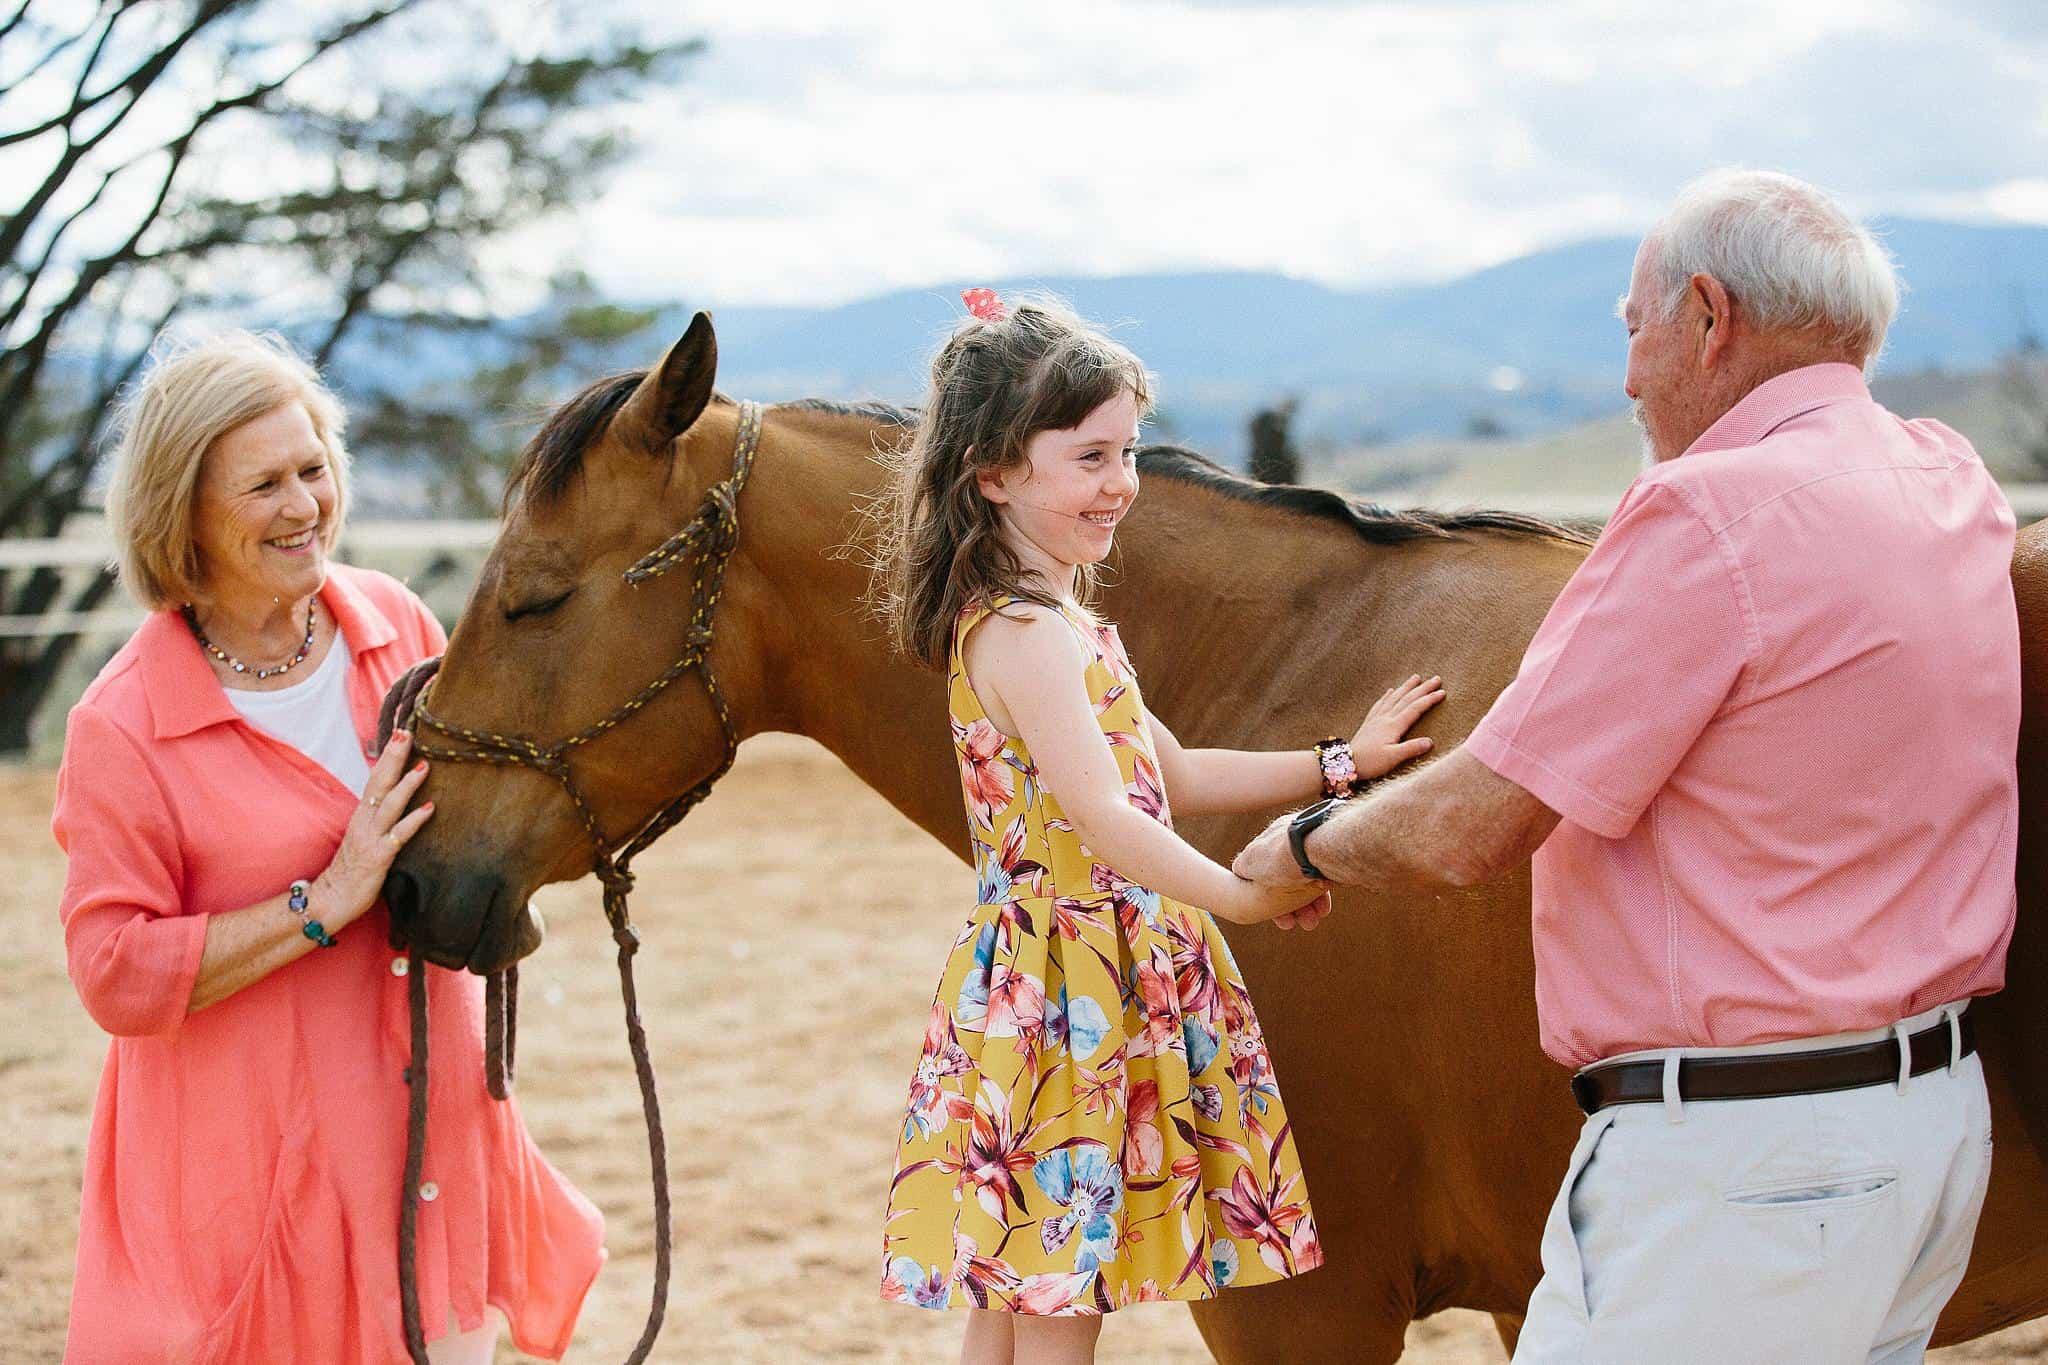 Grandparents help grandchild onto horse